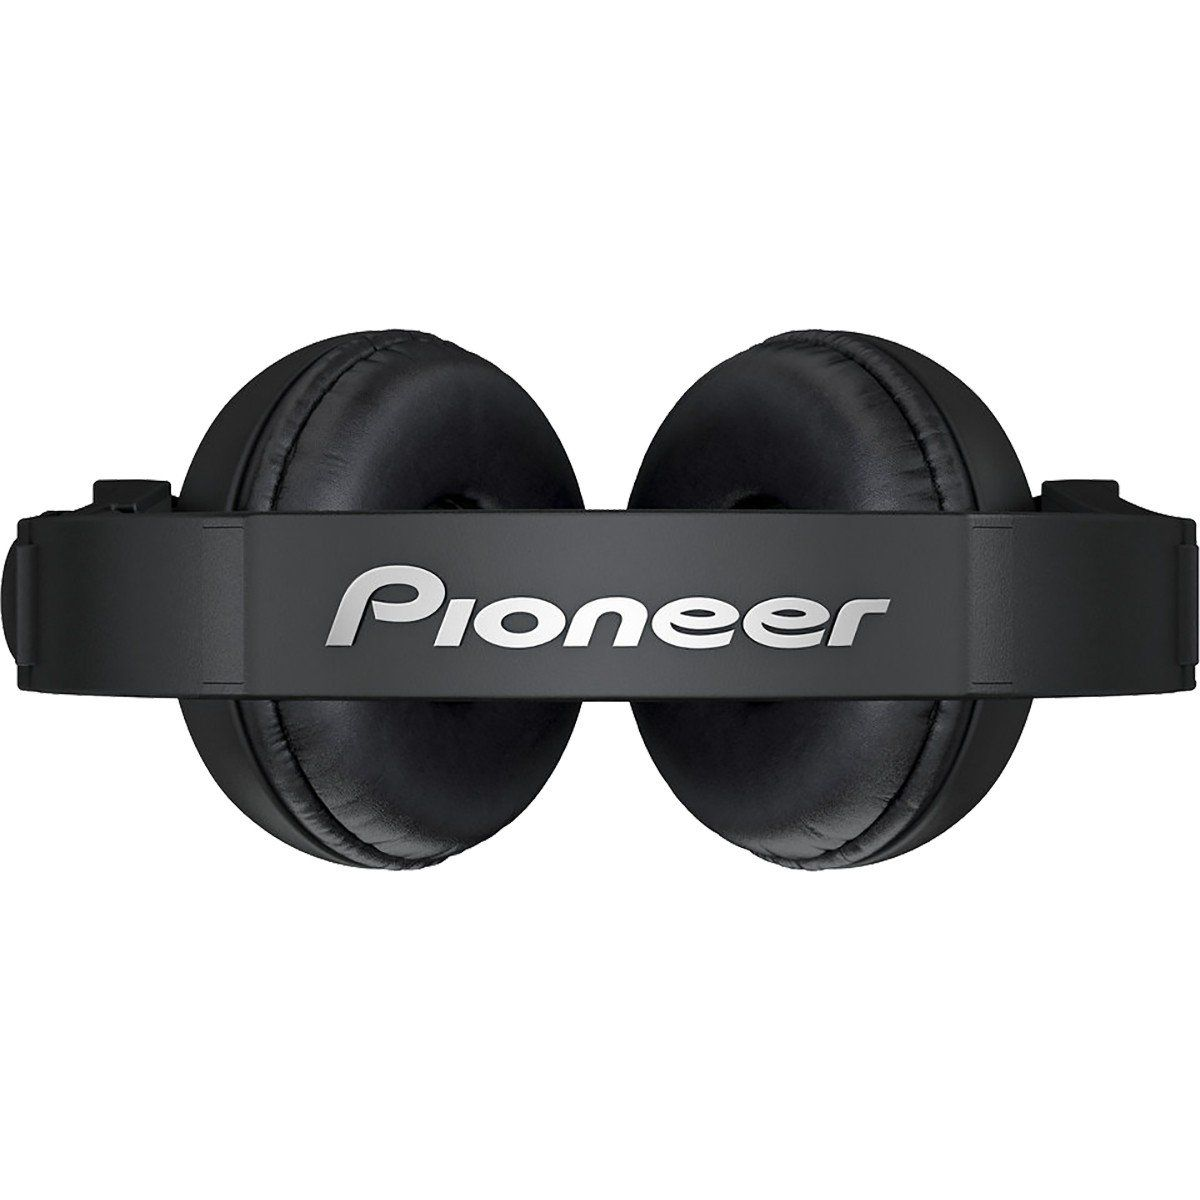 Pioneer HDJ-500 Fone de Ouvido HDJ500 Fechado para DJ Profissional Flexível